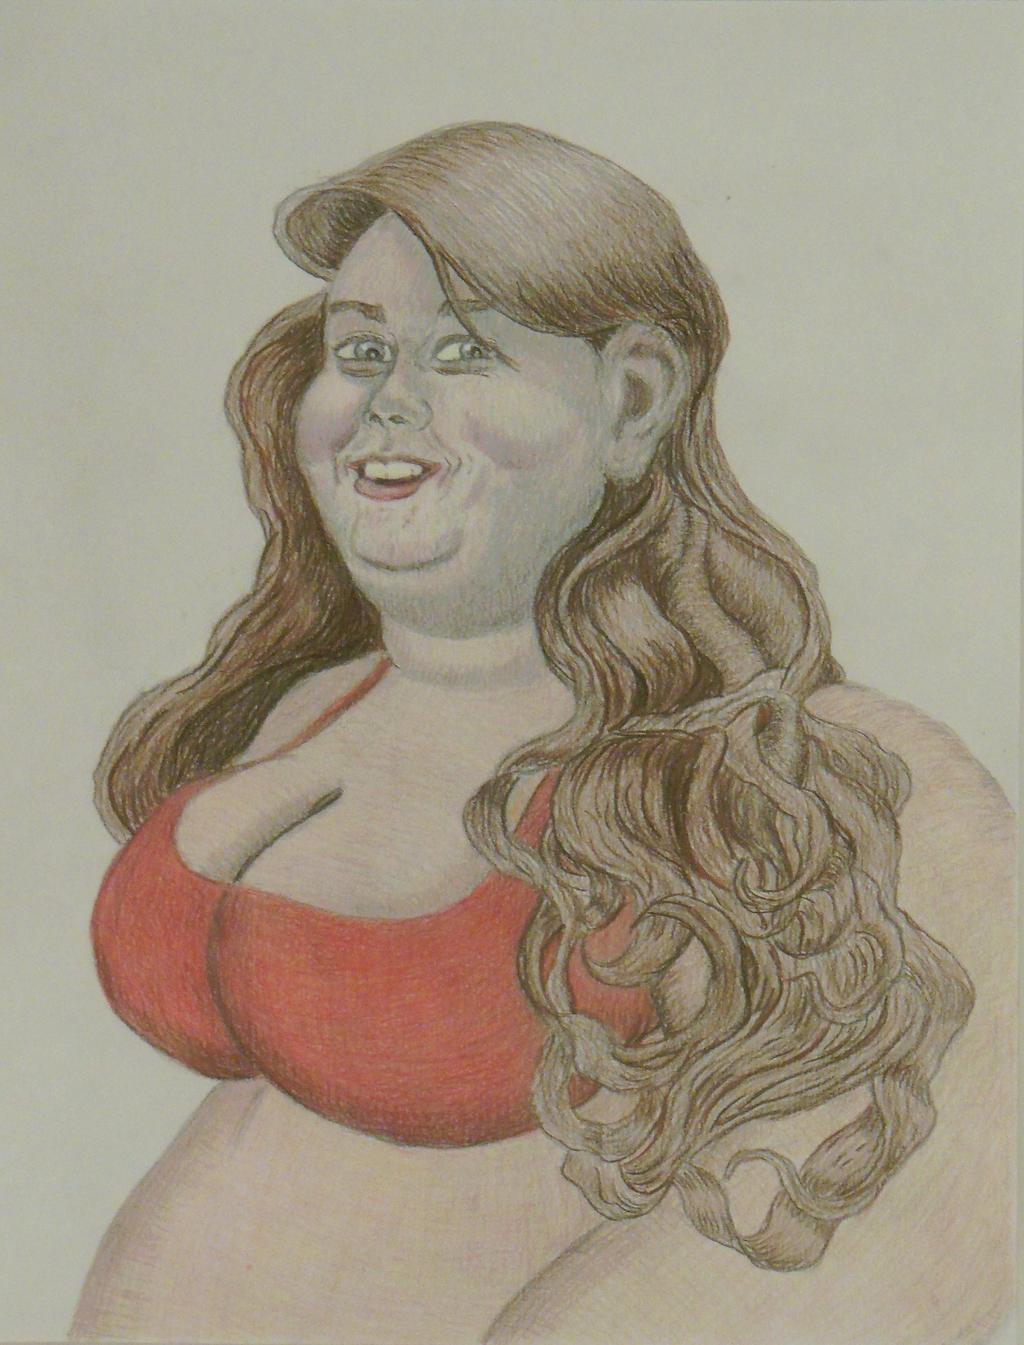 BBW Bigcutie Cherries portrait 2 almost complete by ENT2PRI9SE